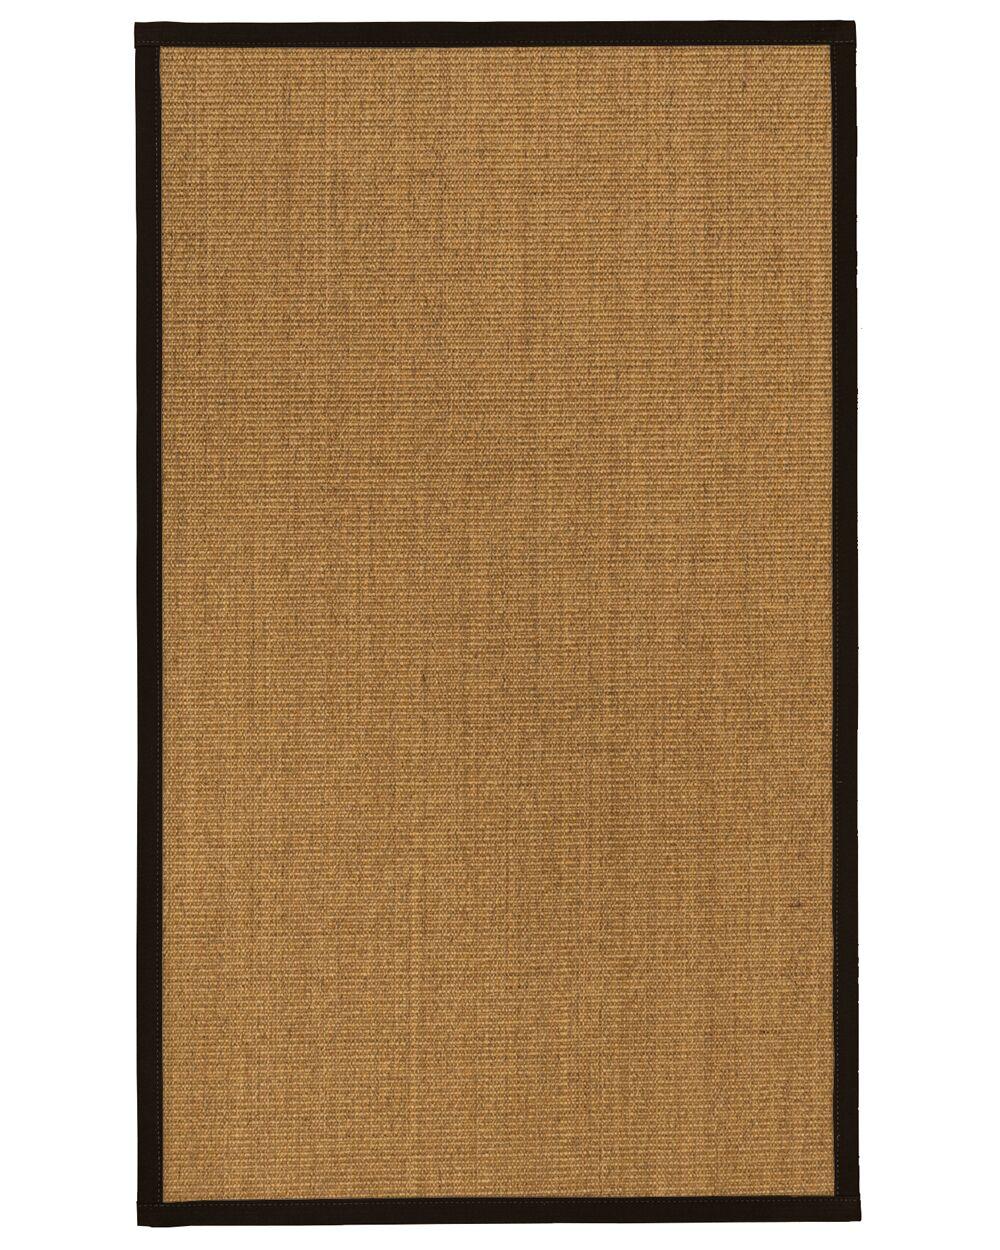 Aspasia Handwoven Flatweave Beige Area Rug Rug Size: Rectangle 6' x 9'